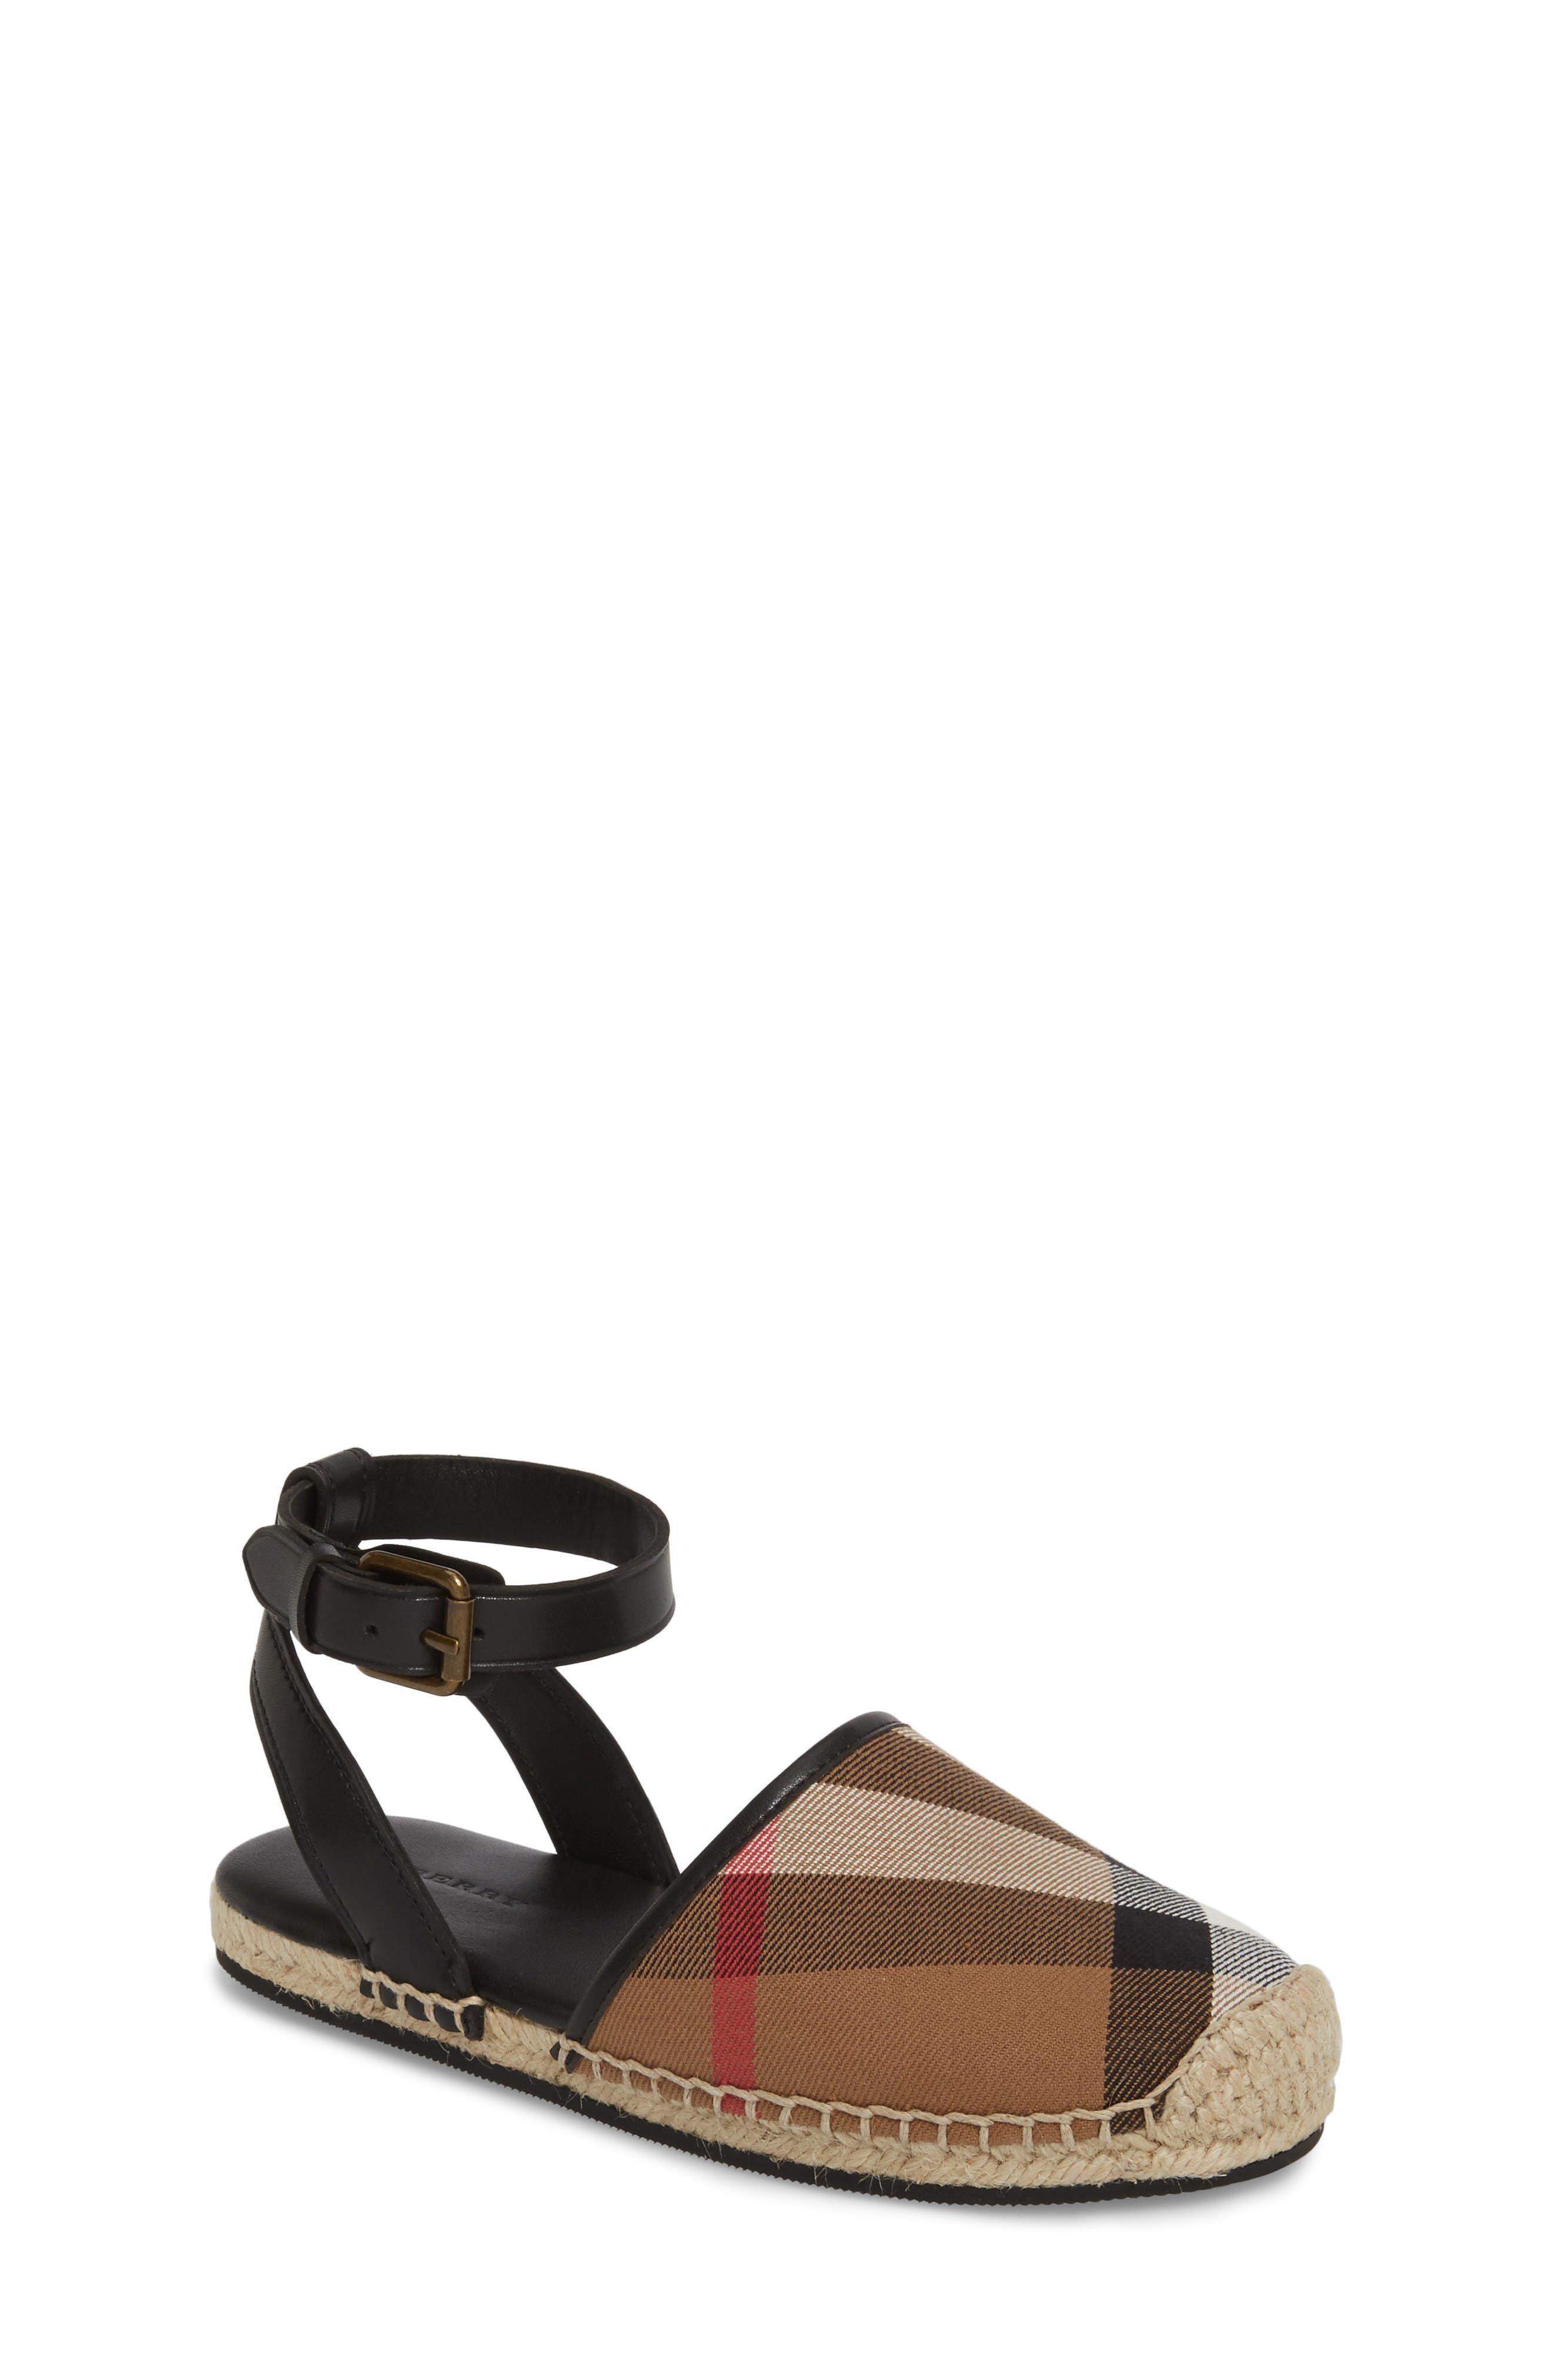 Perth Ankle Strap Sandal,                         Main,                         color, Black